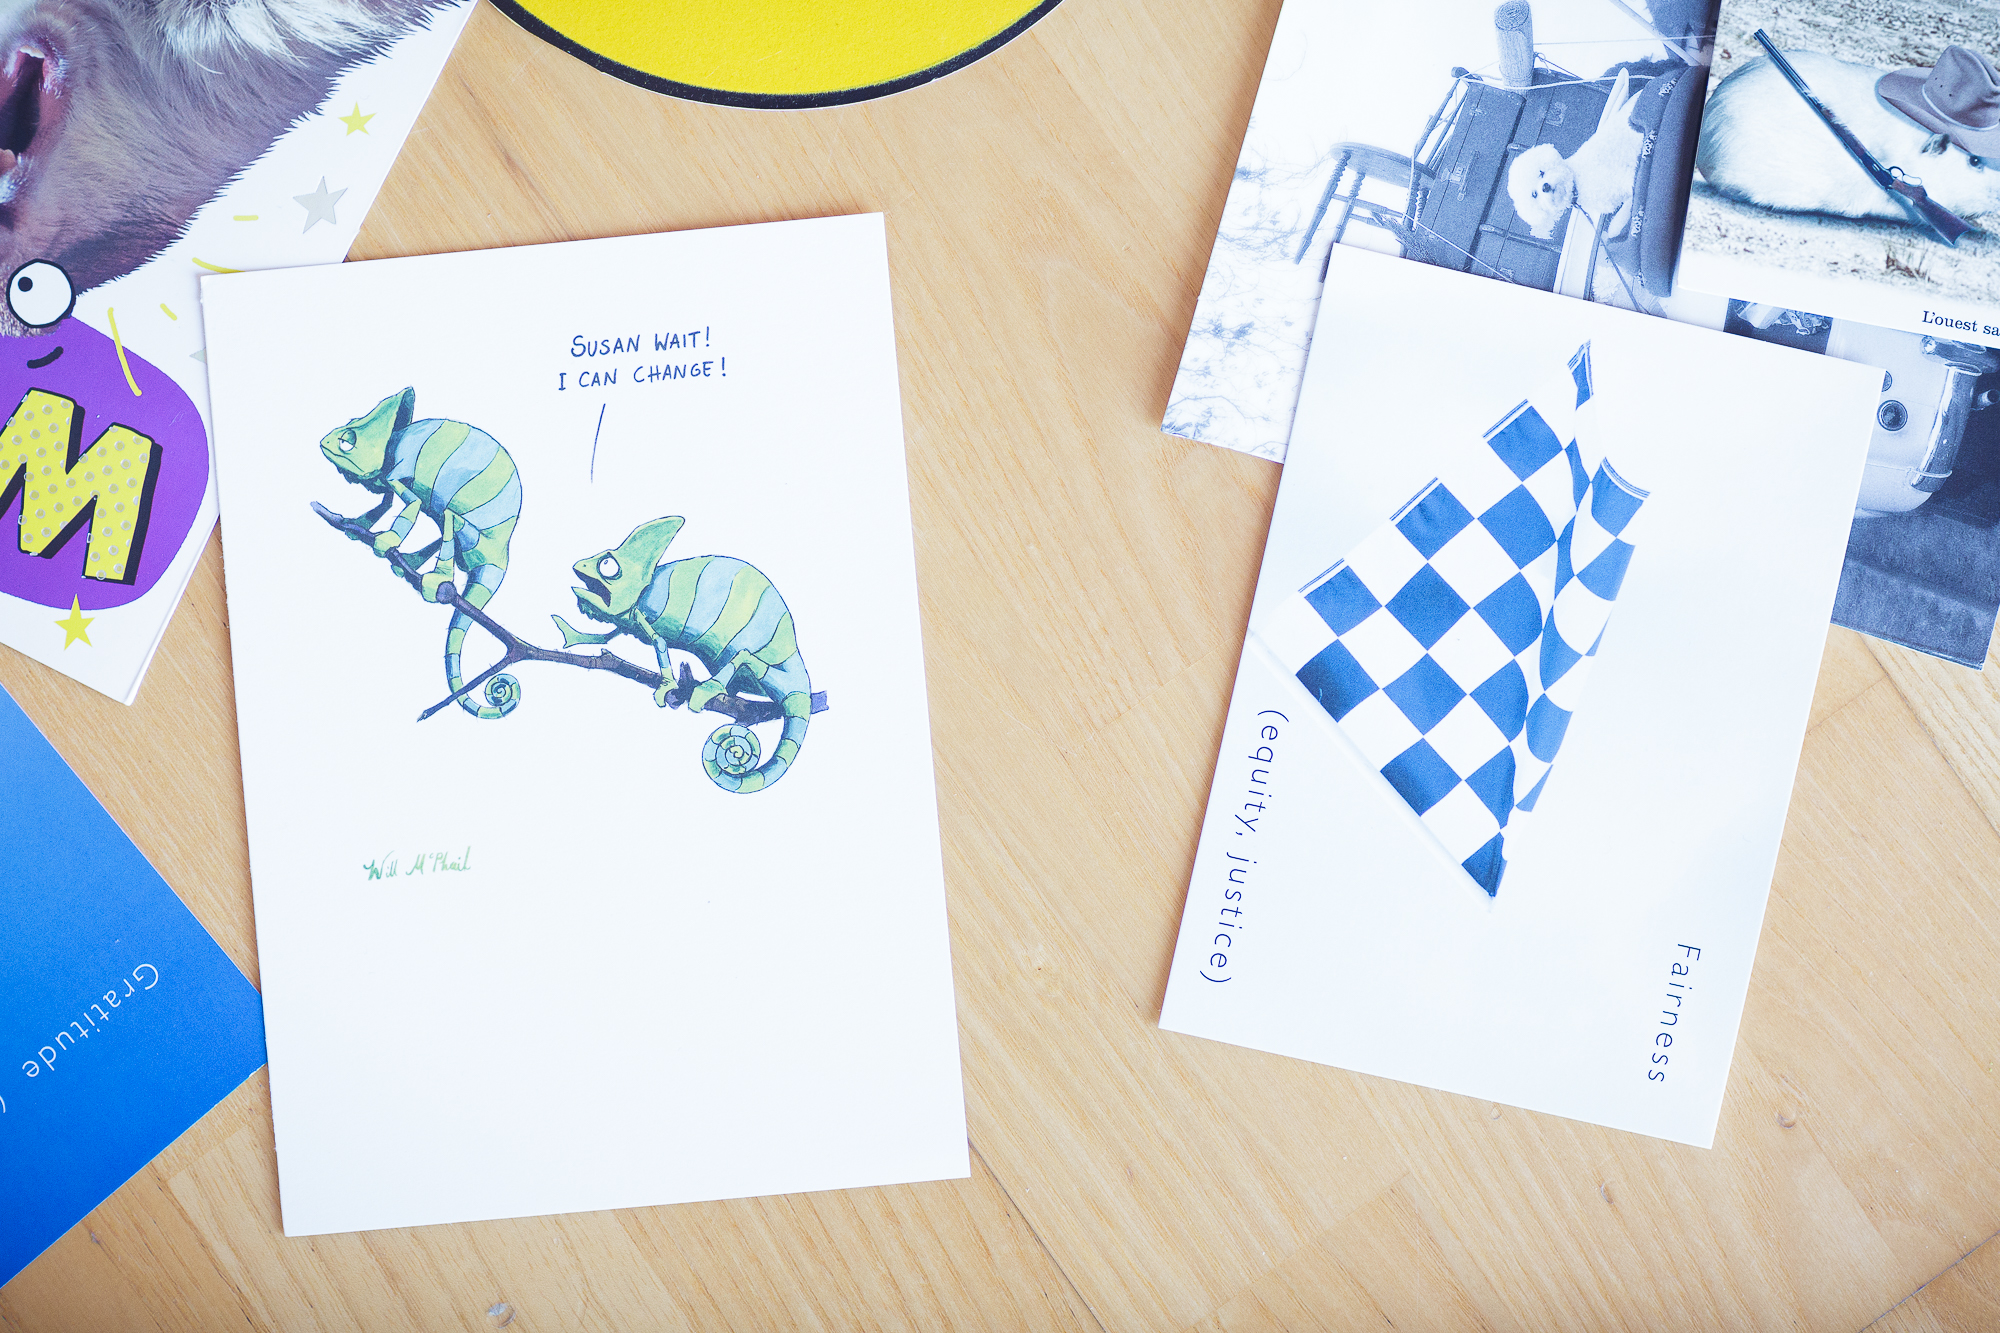 Team exercises - Cards 022.jpg